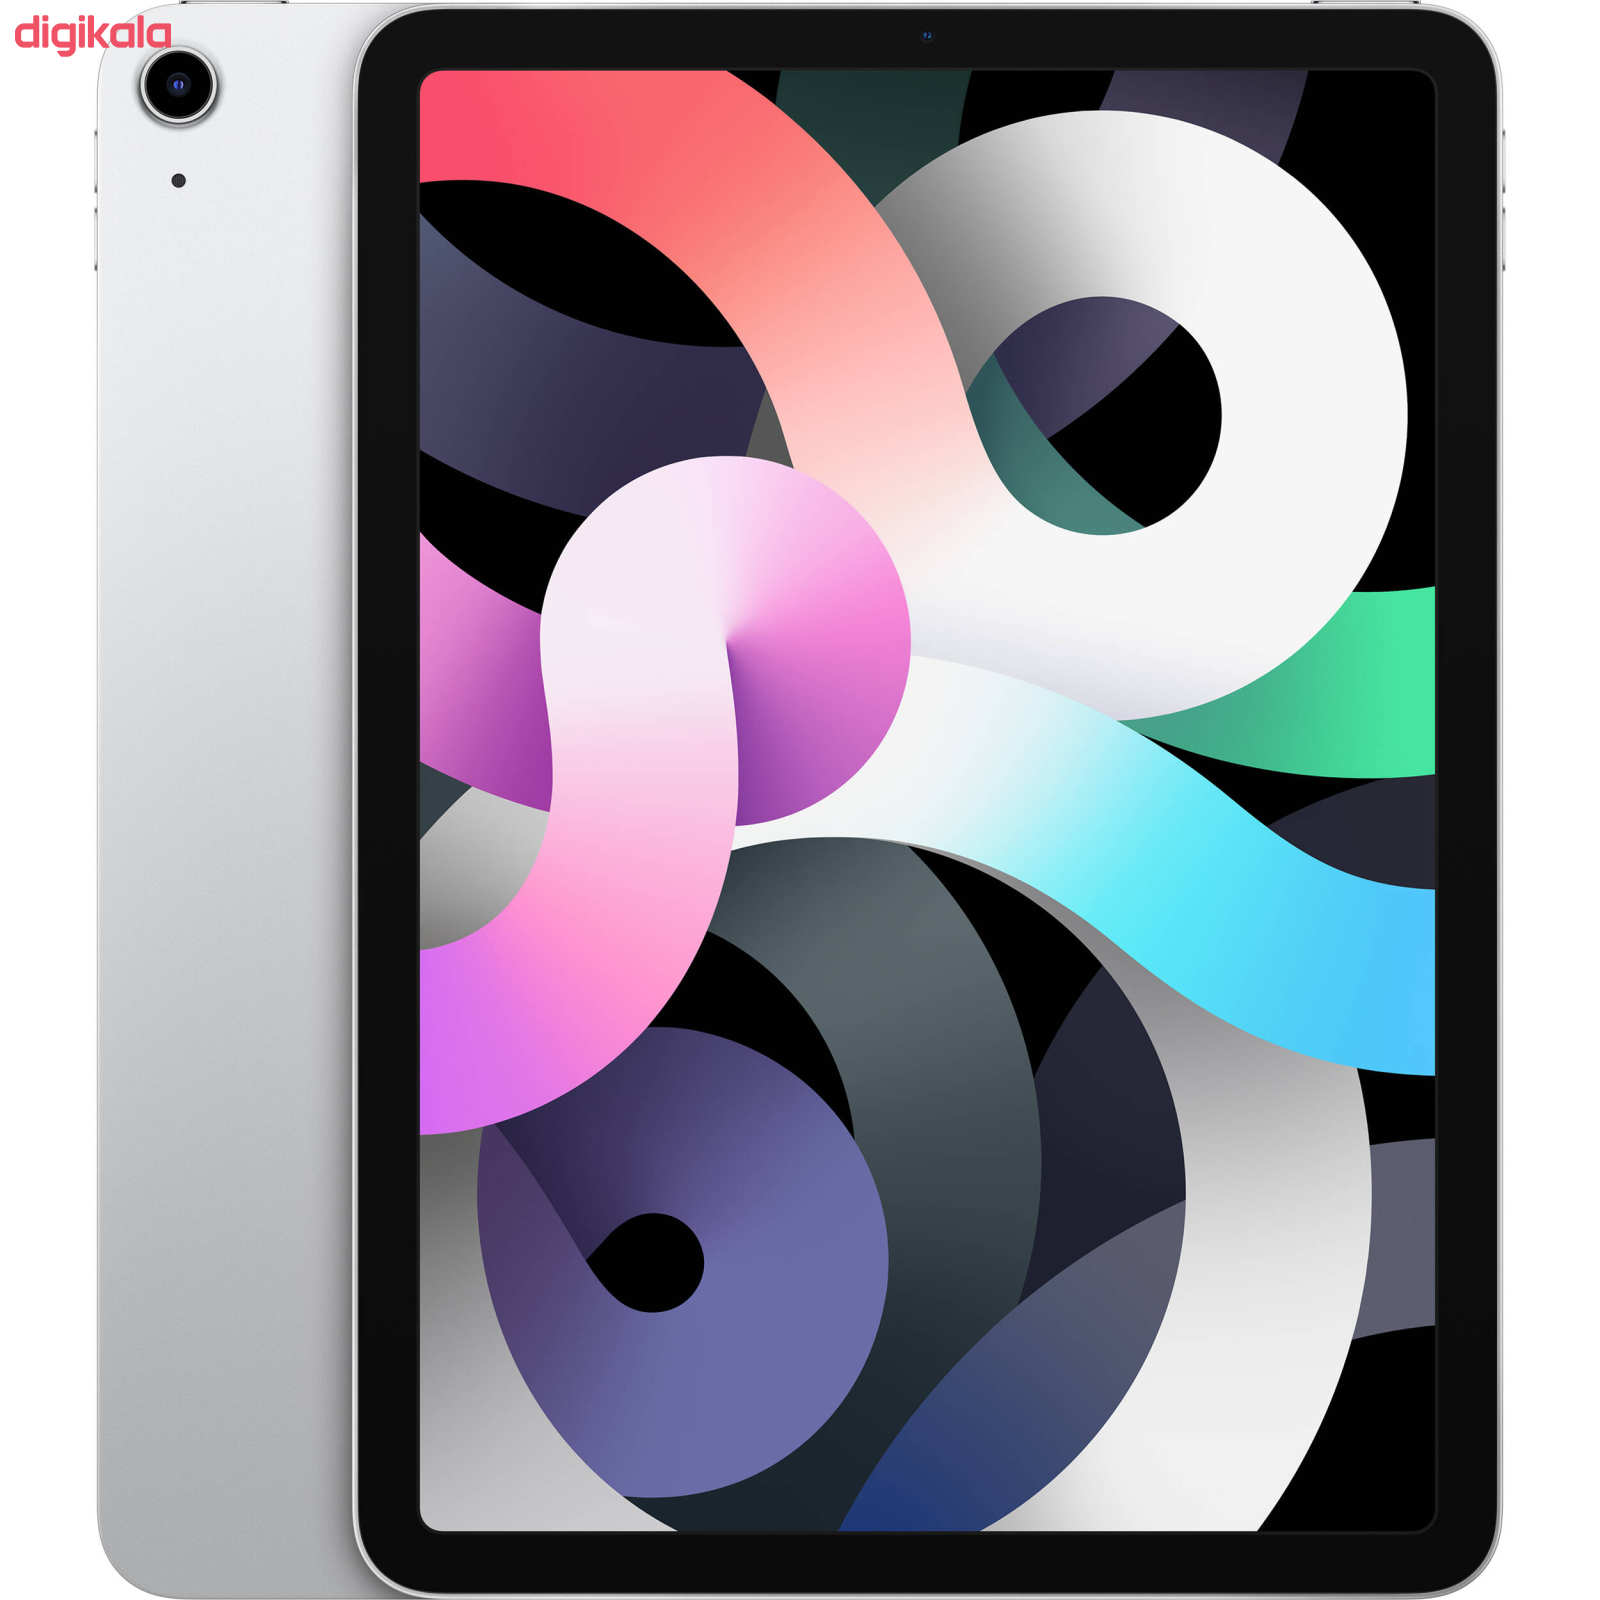 تبلت اپل مدل iPad Air 10.9 inch 2020 WiFi ظرفیت 64 گیگابایت  main 1 13